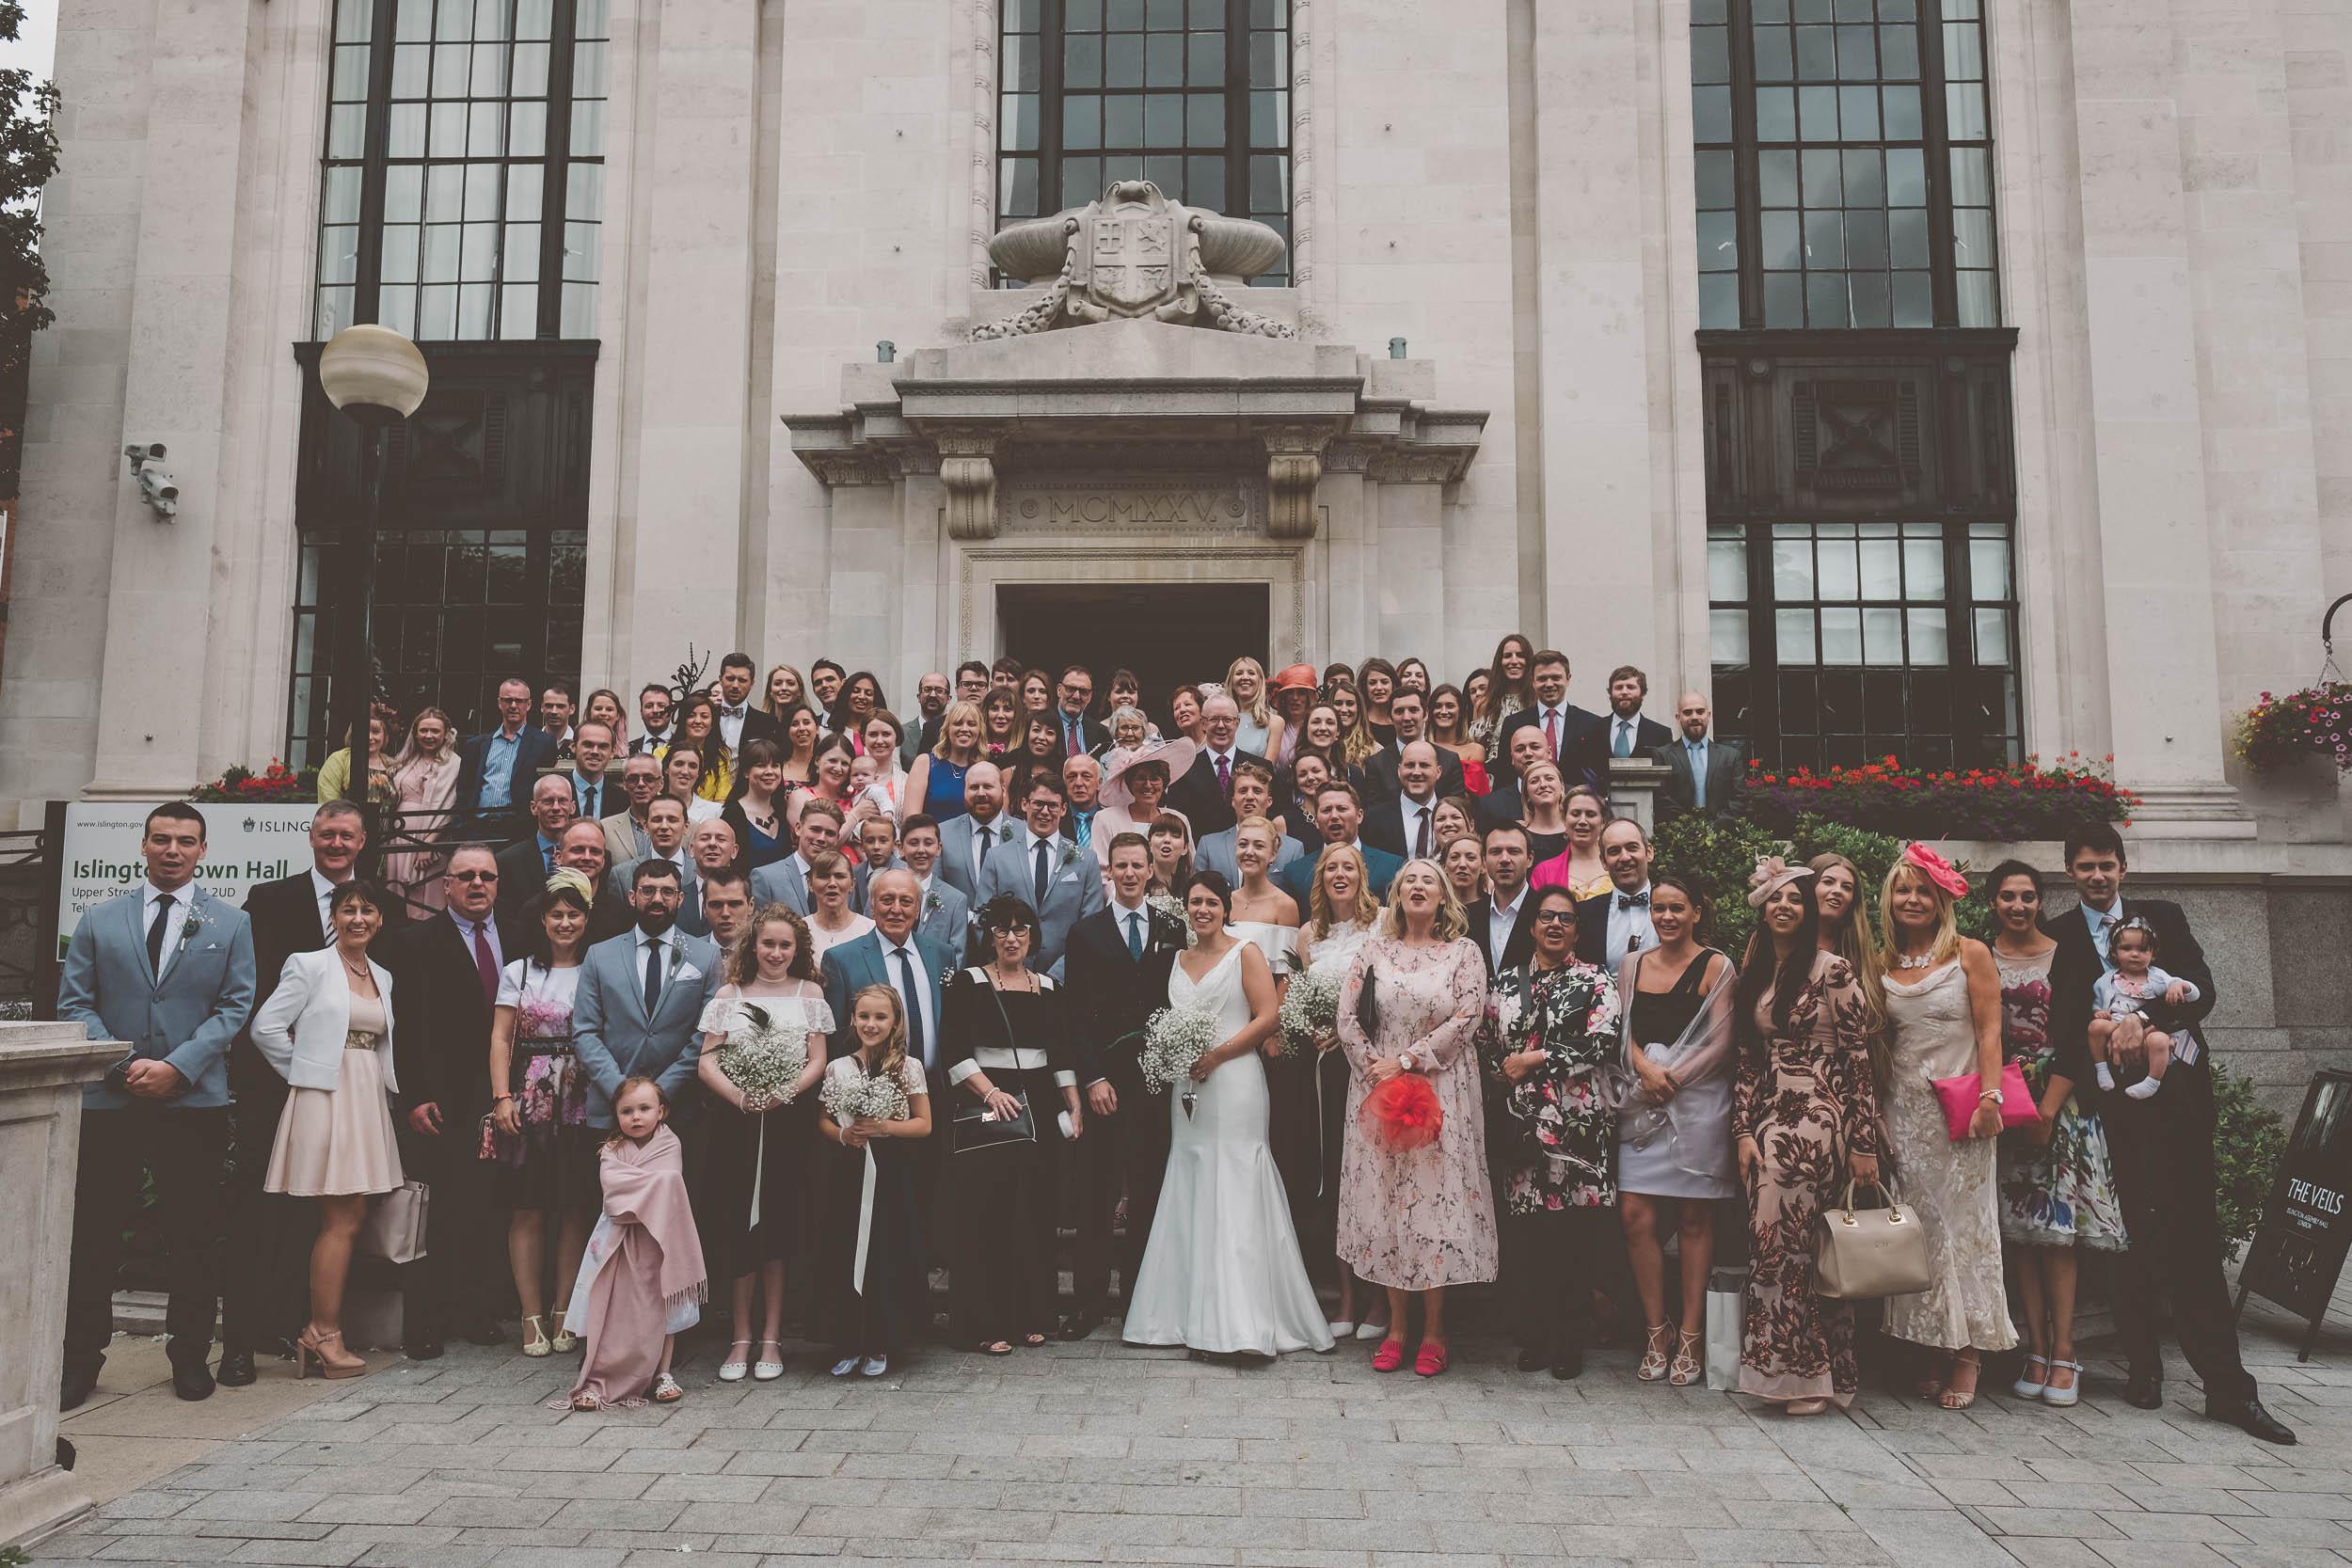 islington-town-hall-4th-floor-studios-wedding165.jpg